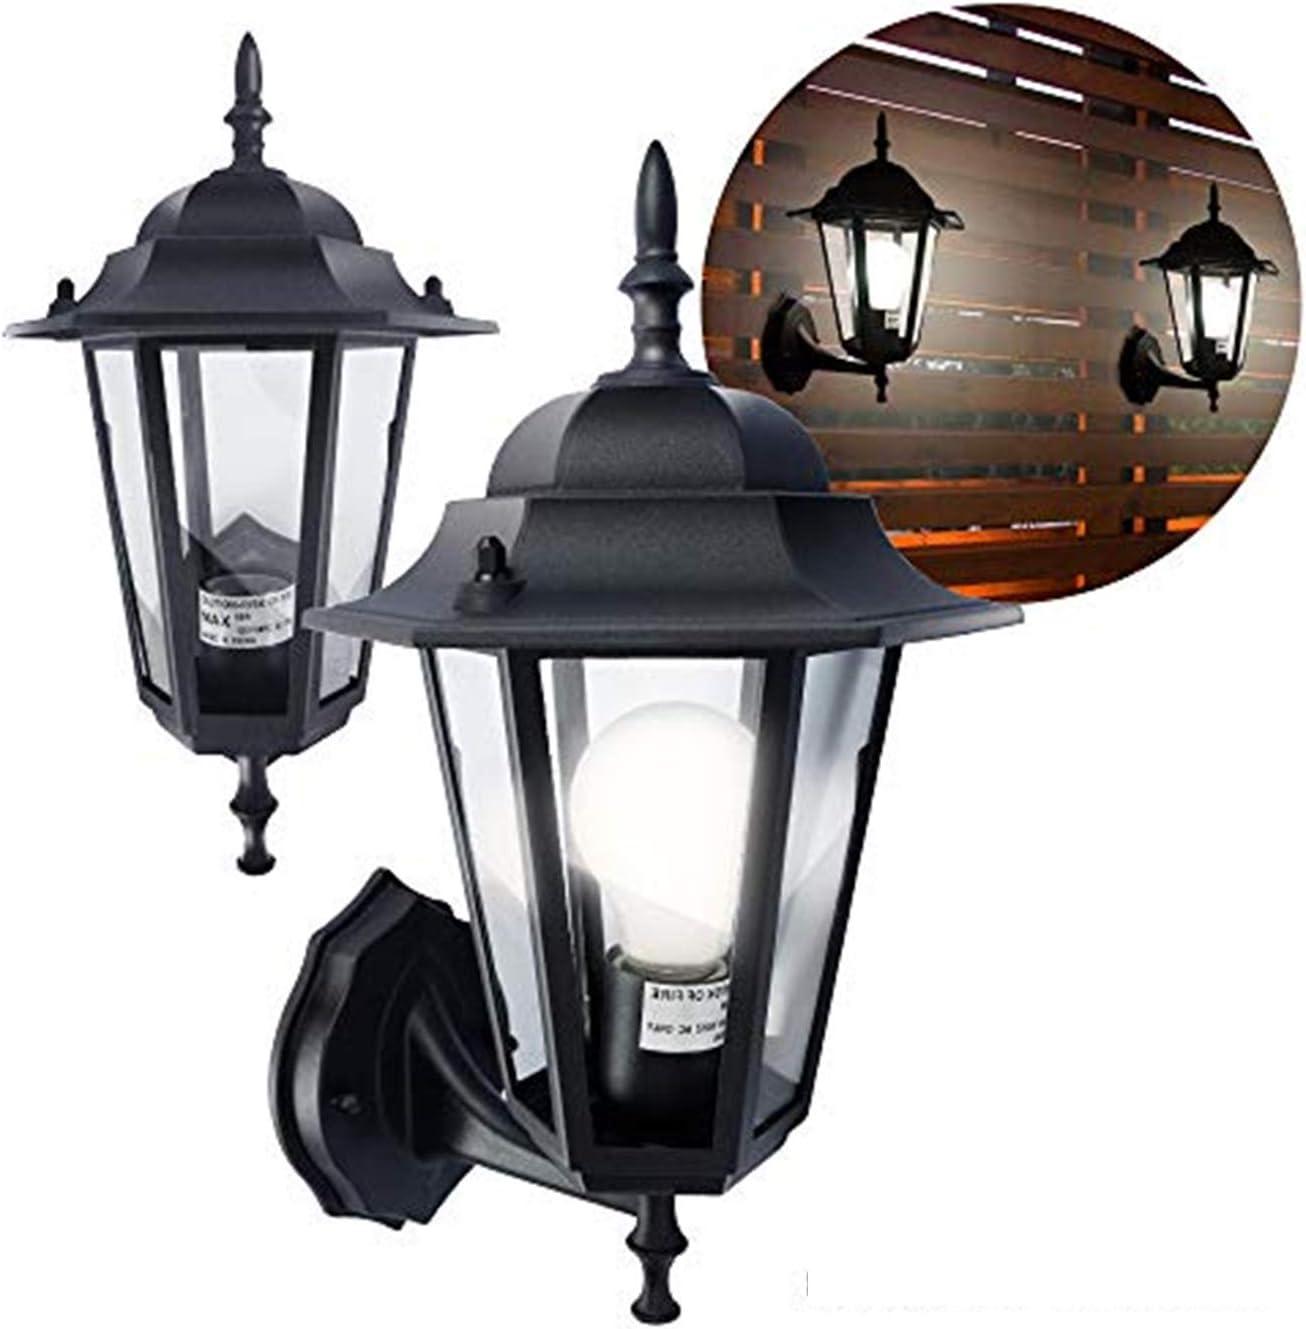 ETOPLIGHTING  2-Pack  Matte Black Aluminum Exterior Outdoor Wall Lantern for Porches, Entrances, Garages, Patios, APL1713